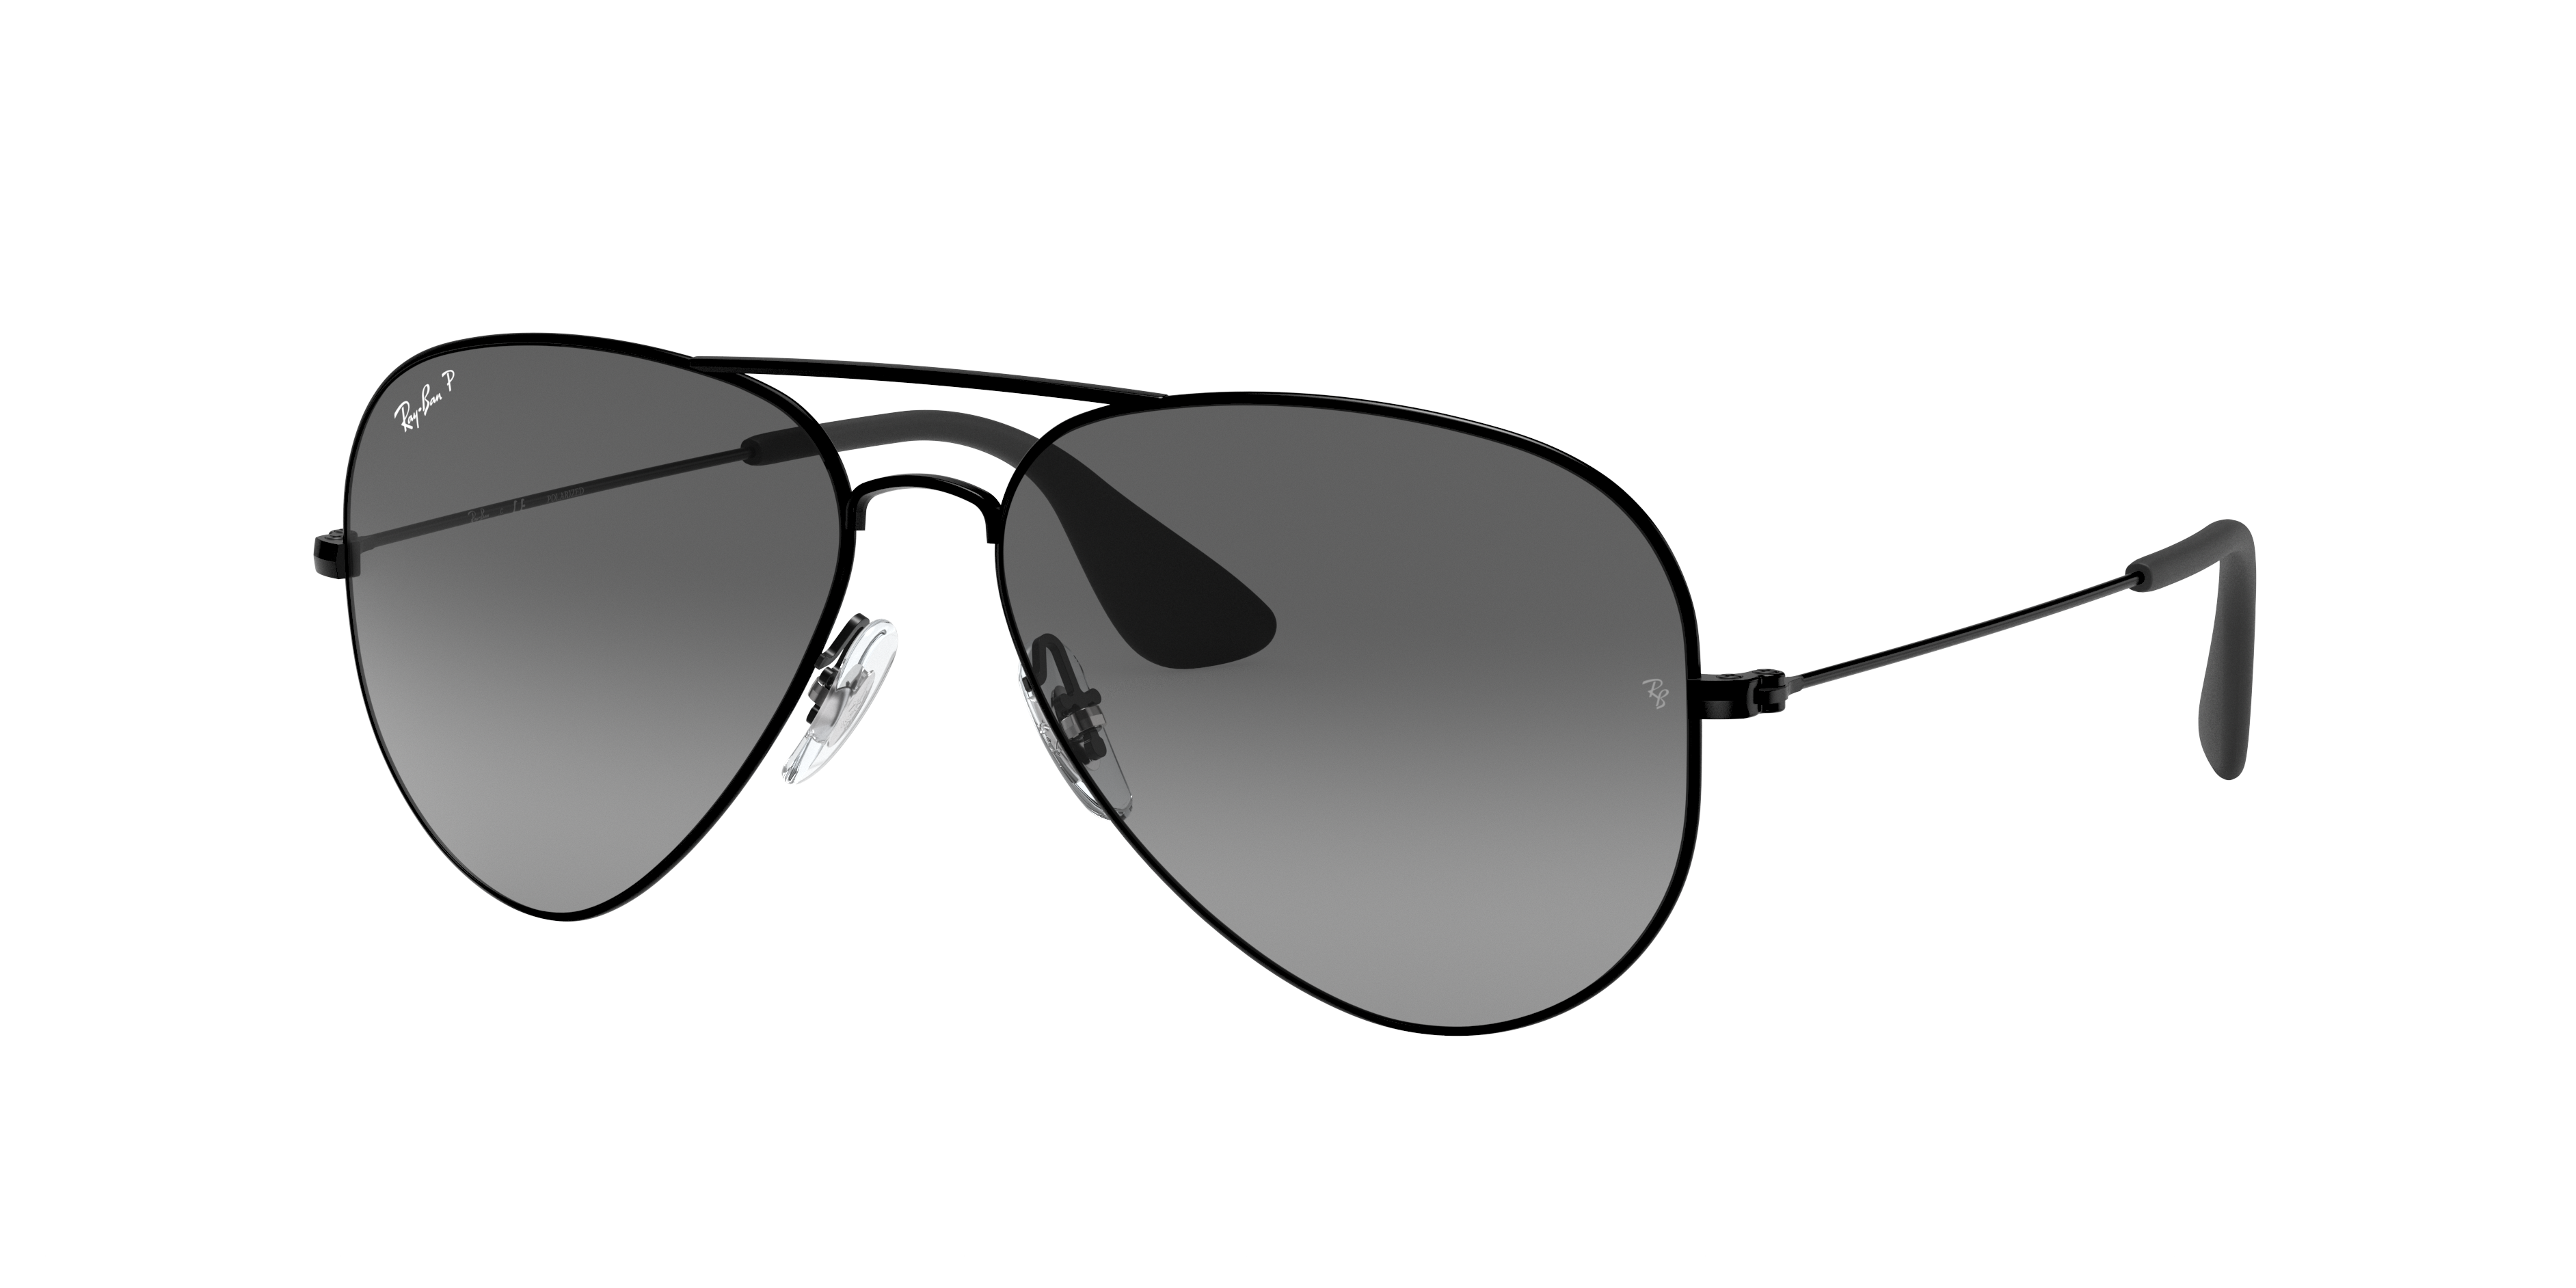 Ray-Ban Rb3558 Black, Polarized Gray Lenses - RB3558